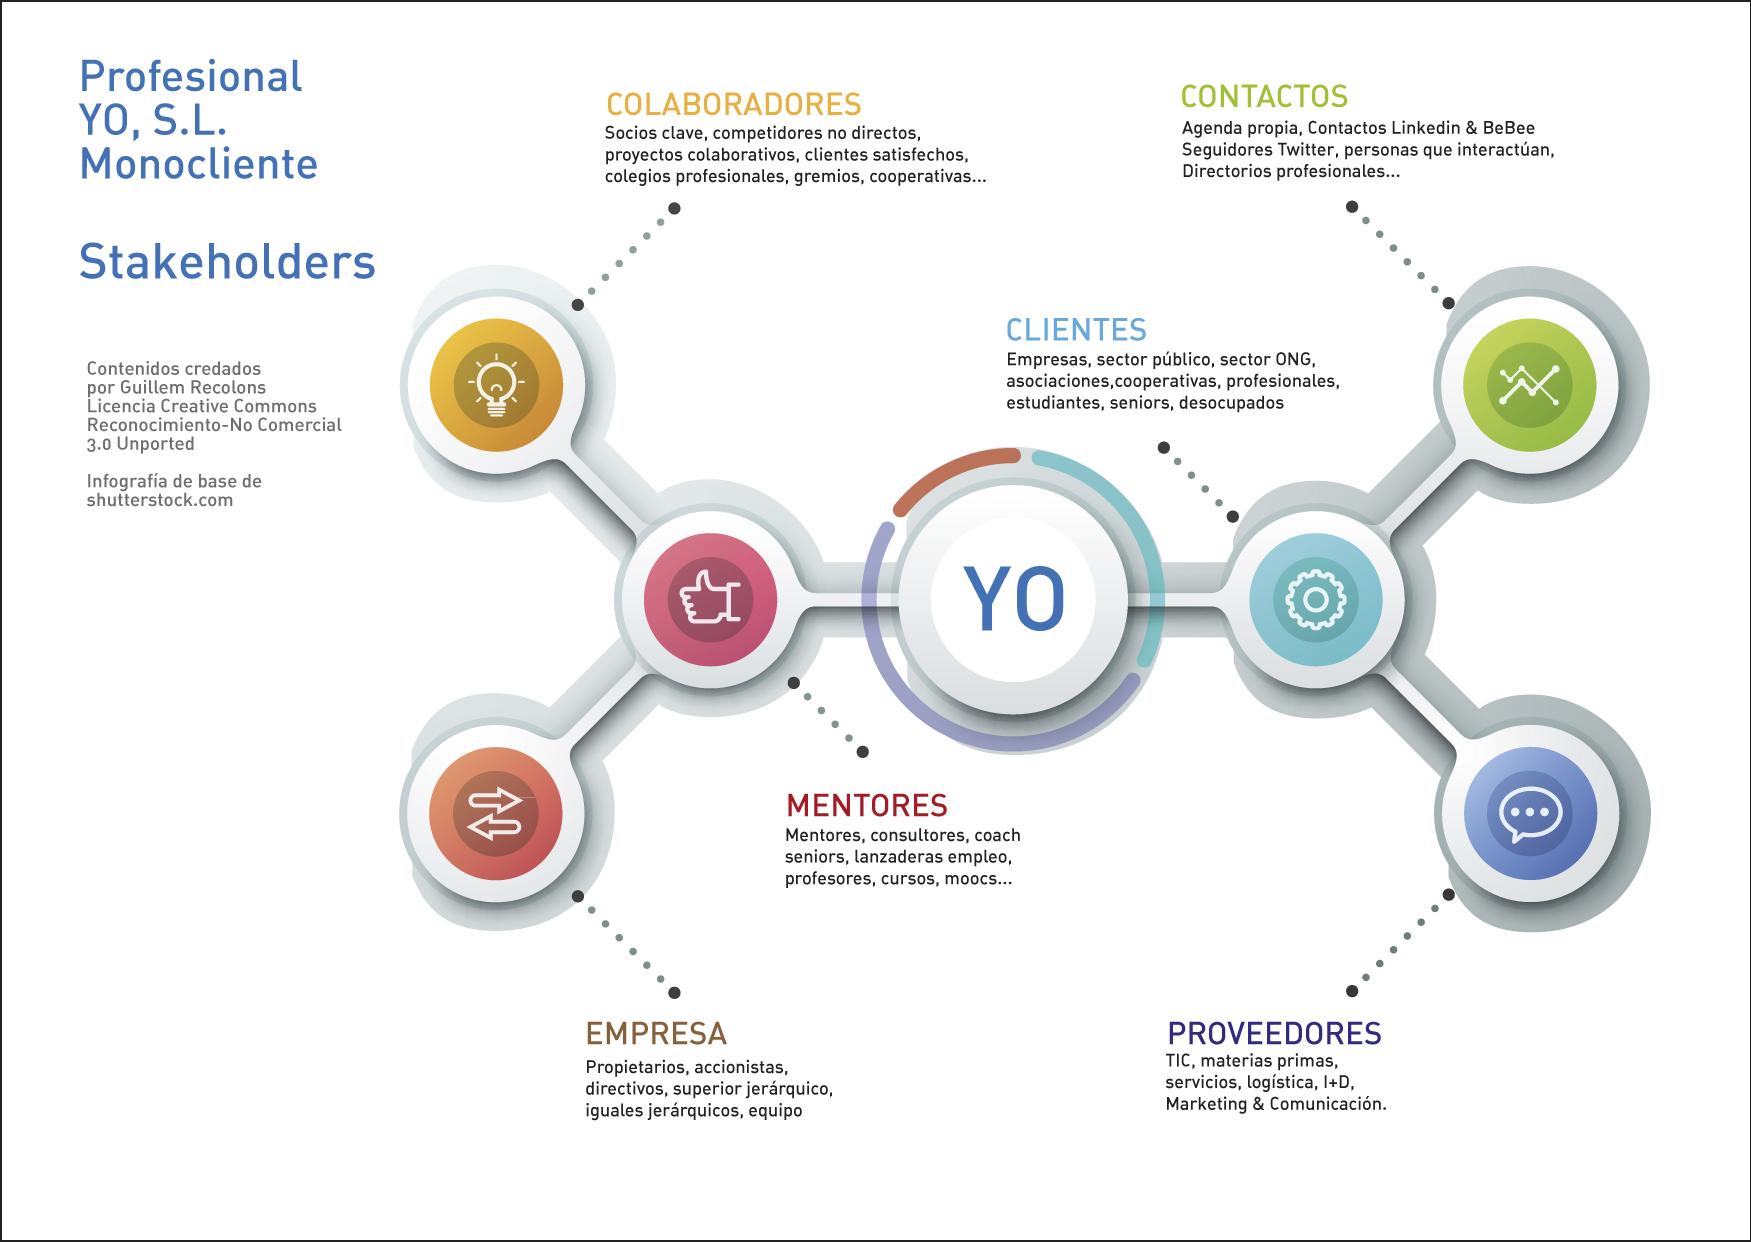 Stakeholders personales profesionales por cuenta ajena